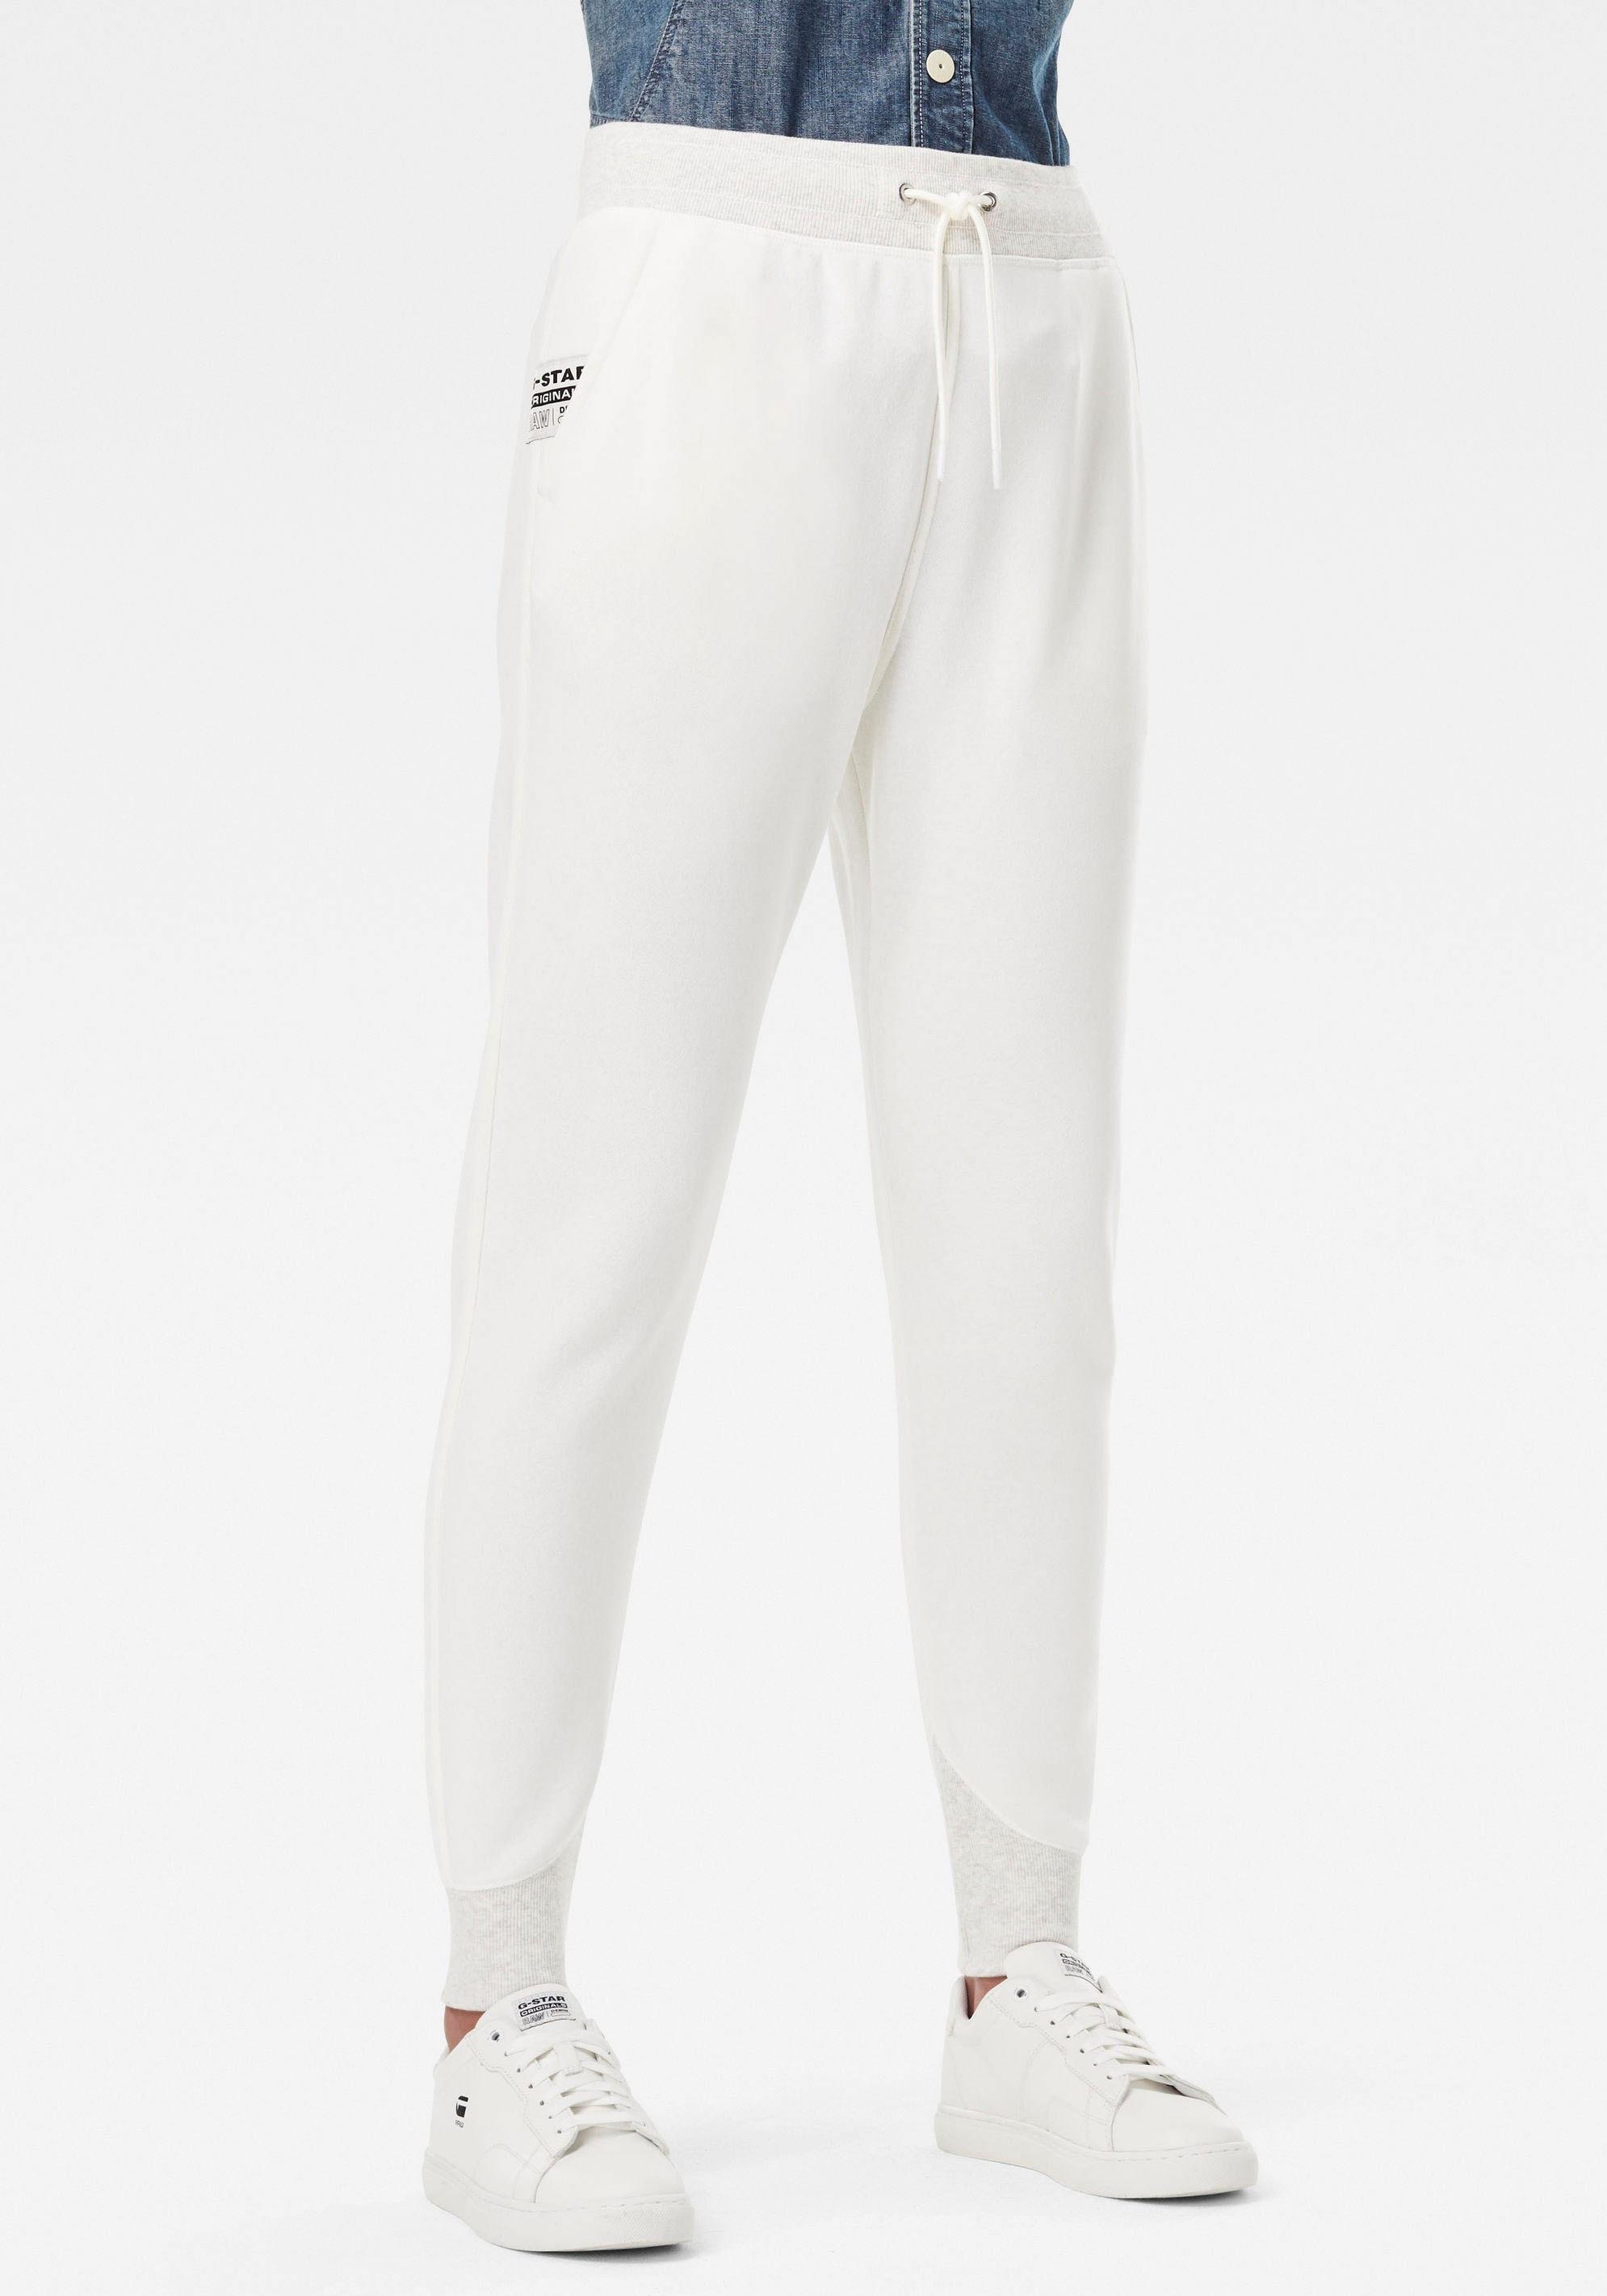 g-star raw -  Sweatpants Premium Core 3D Tapered Sweatpants, 3D Jogginghose mit abgerundeter Designlinie am Knöchel